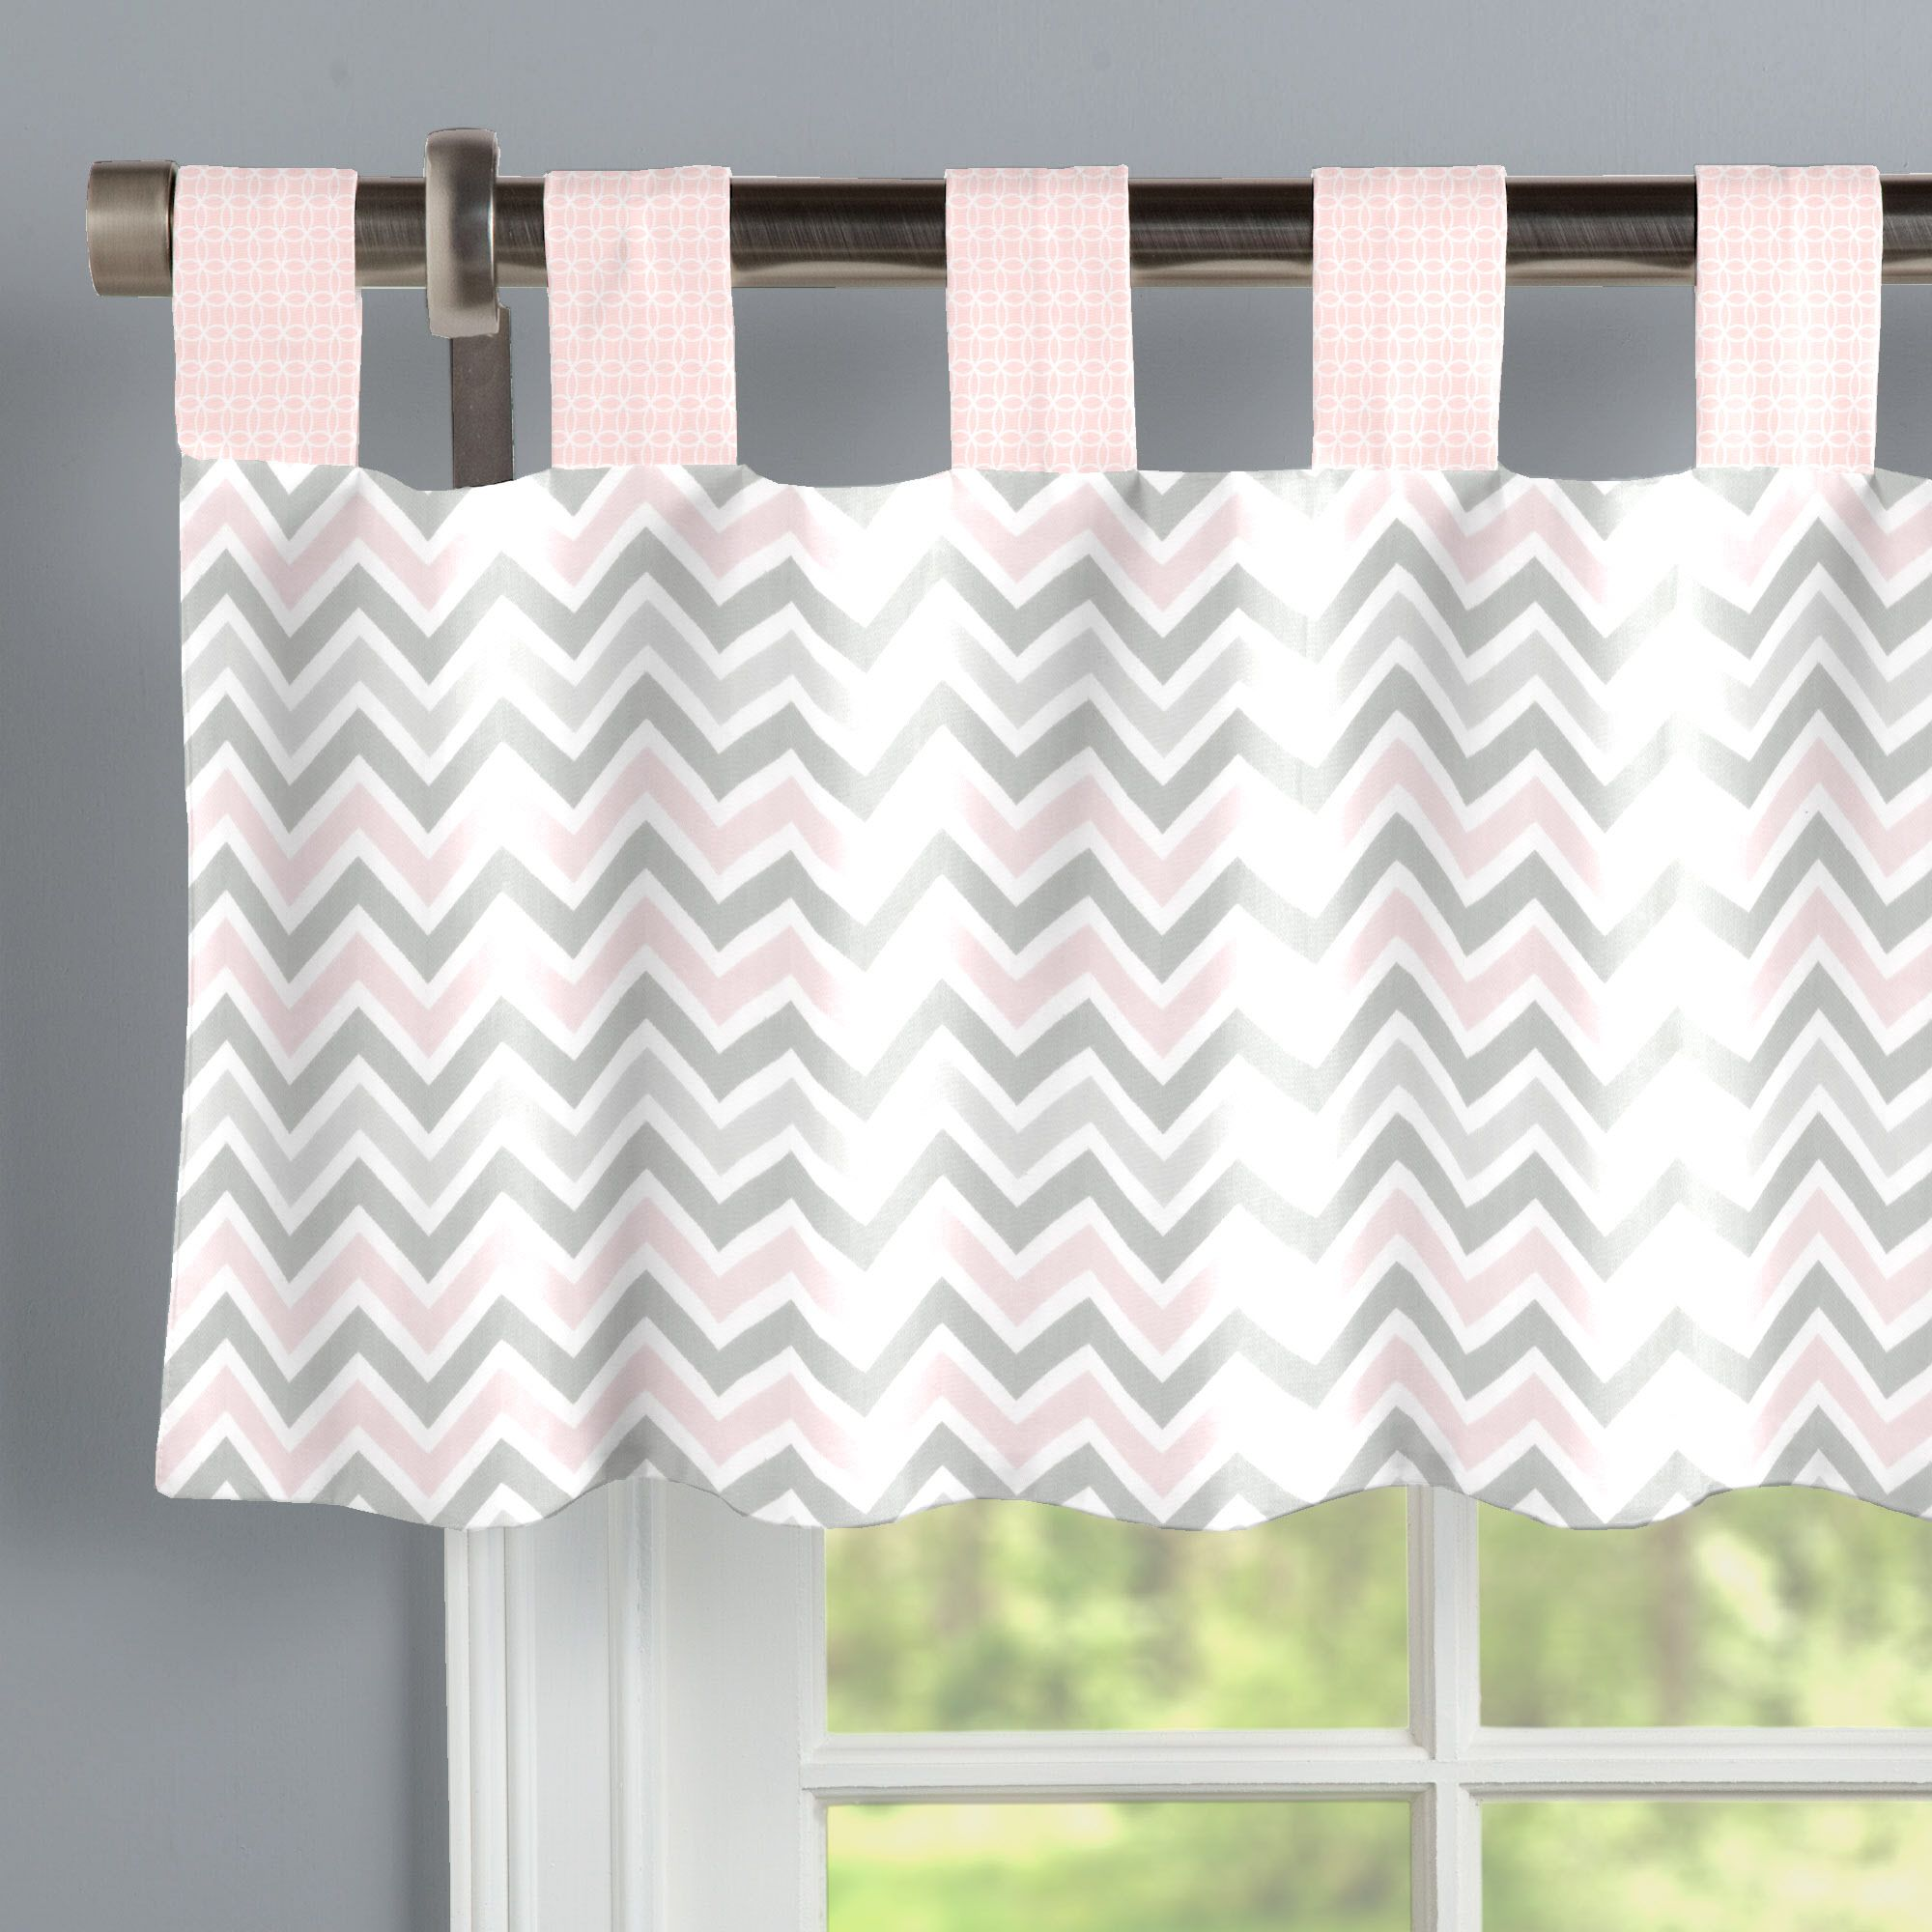 Pink And Gray Chevron Window Valance Tab Top Window Valance Pink And Gray Nursery Valance